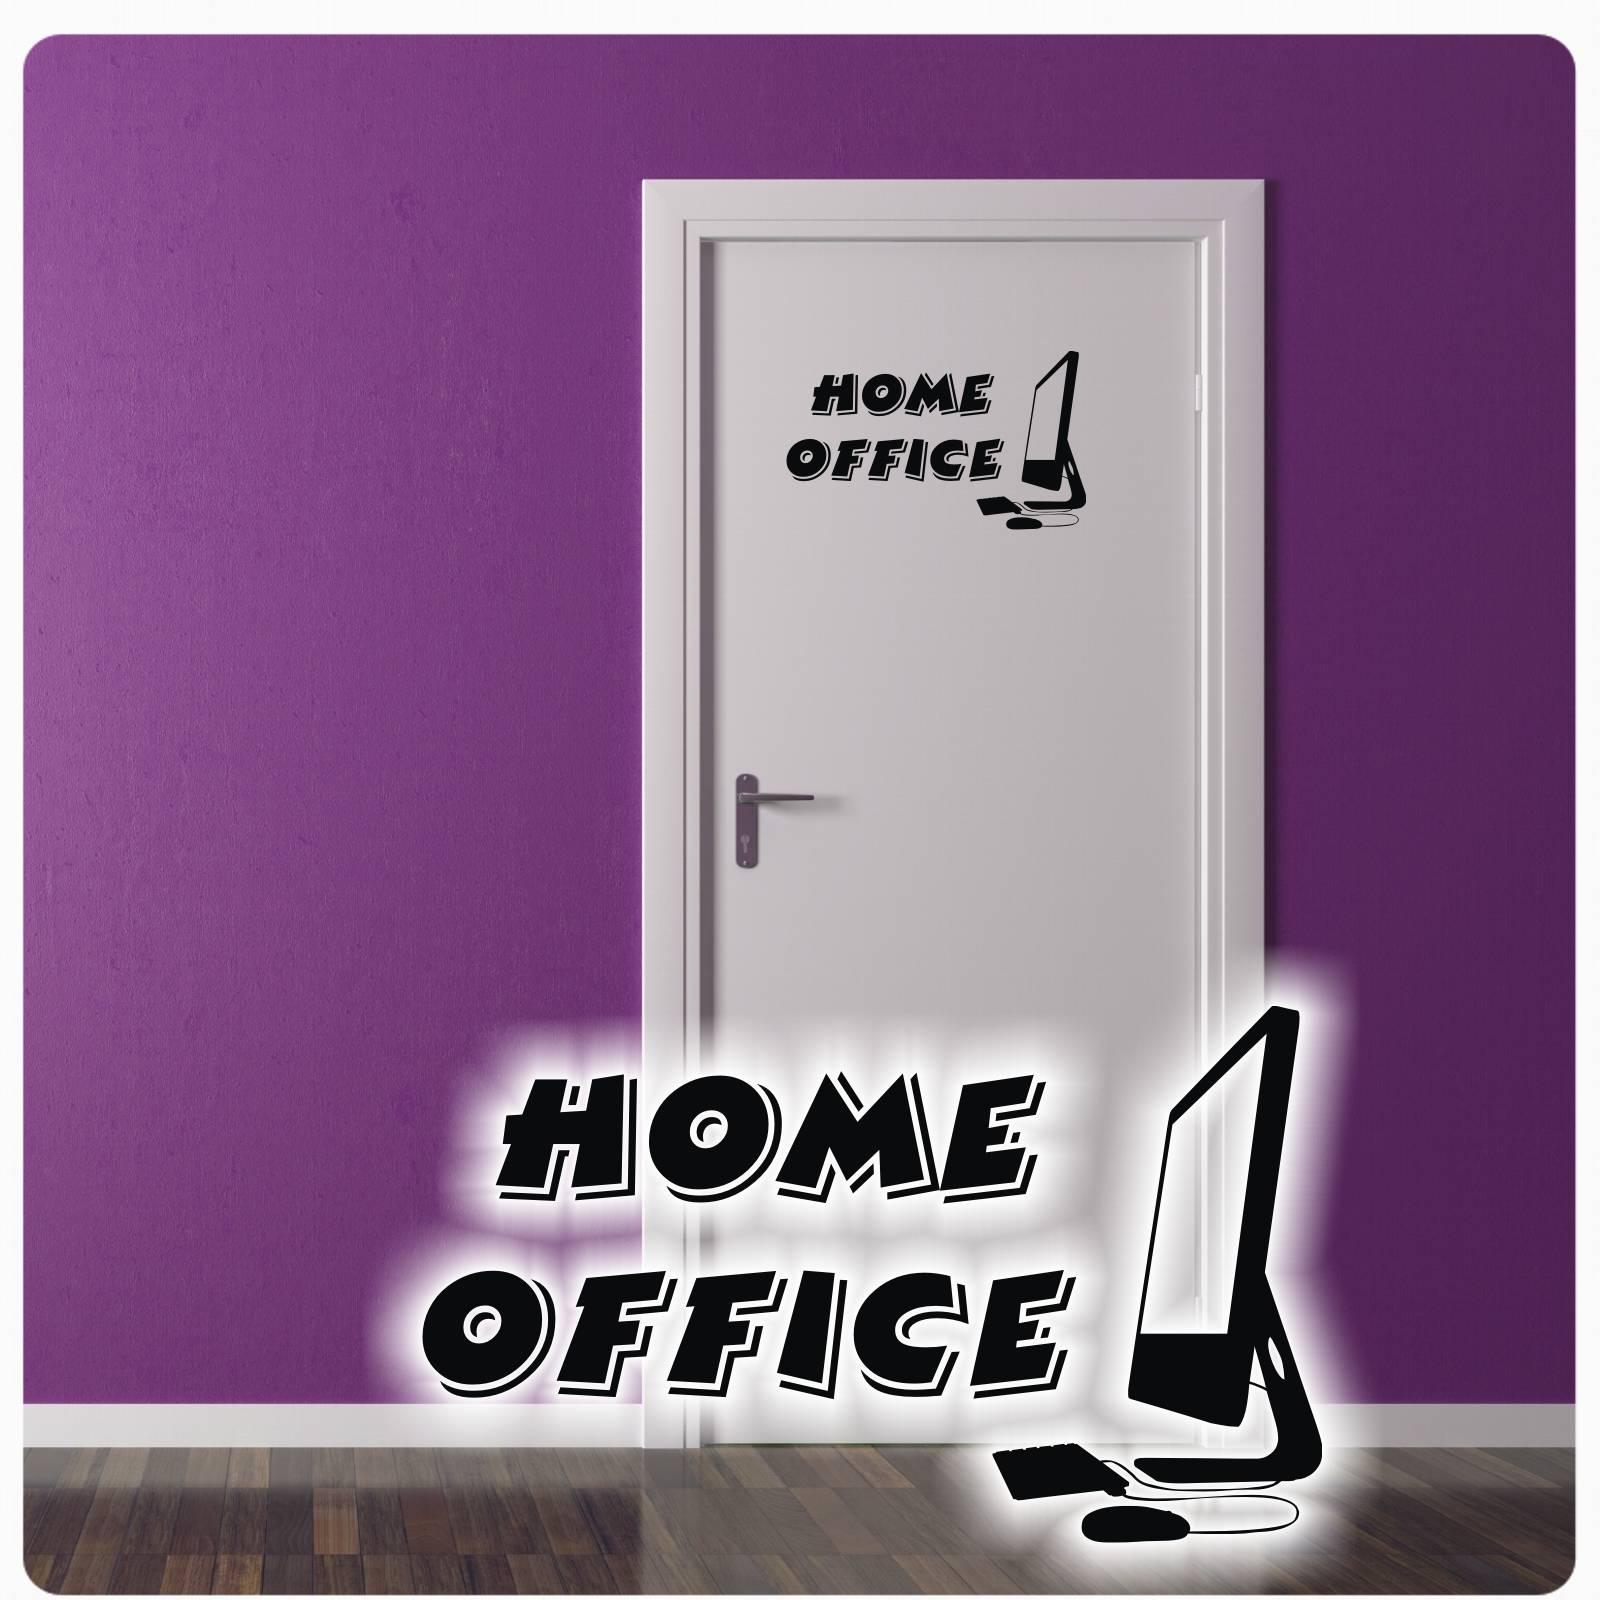 Home Office Buro Turaufkleber Wandtattoo Tur Aufkleber Sticker